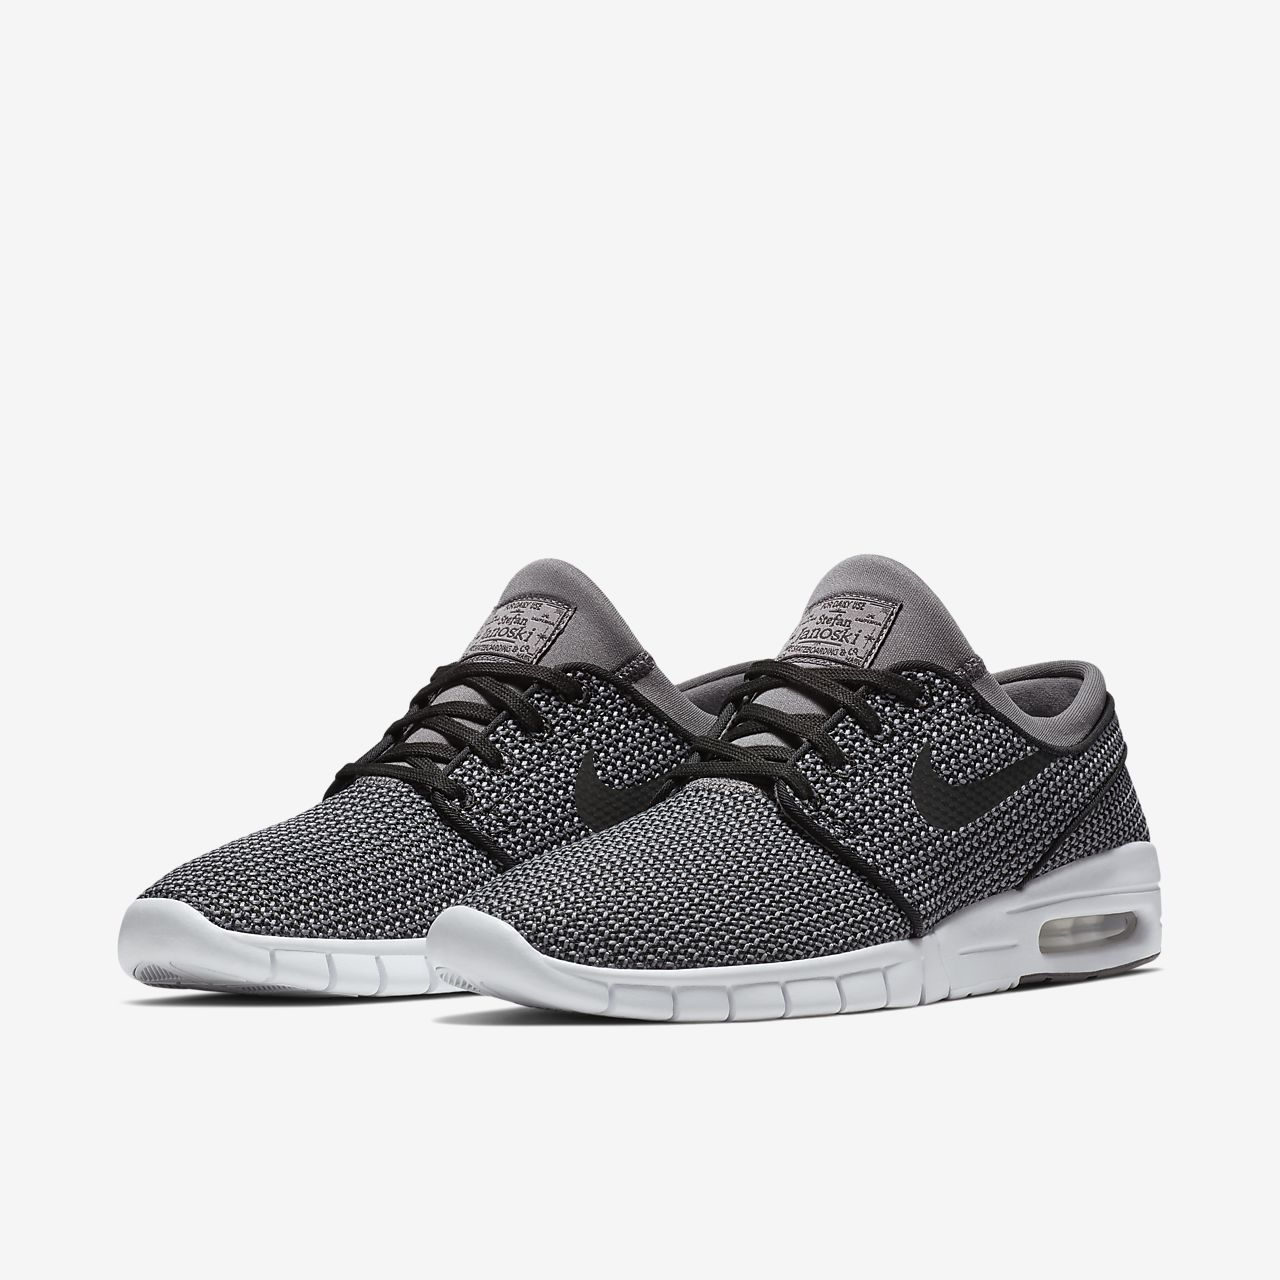 Nike Stefan Janoski Max, Chaussures de Skateboard Homme, Noir (Black-Anthracite-Black), 38.5 EU